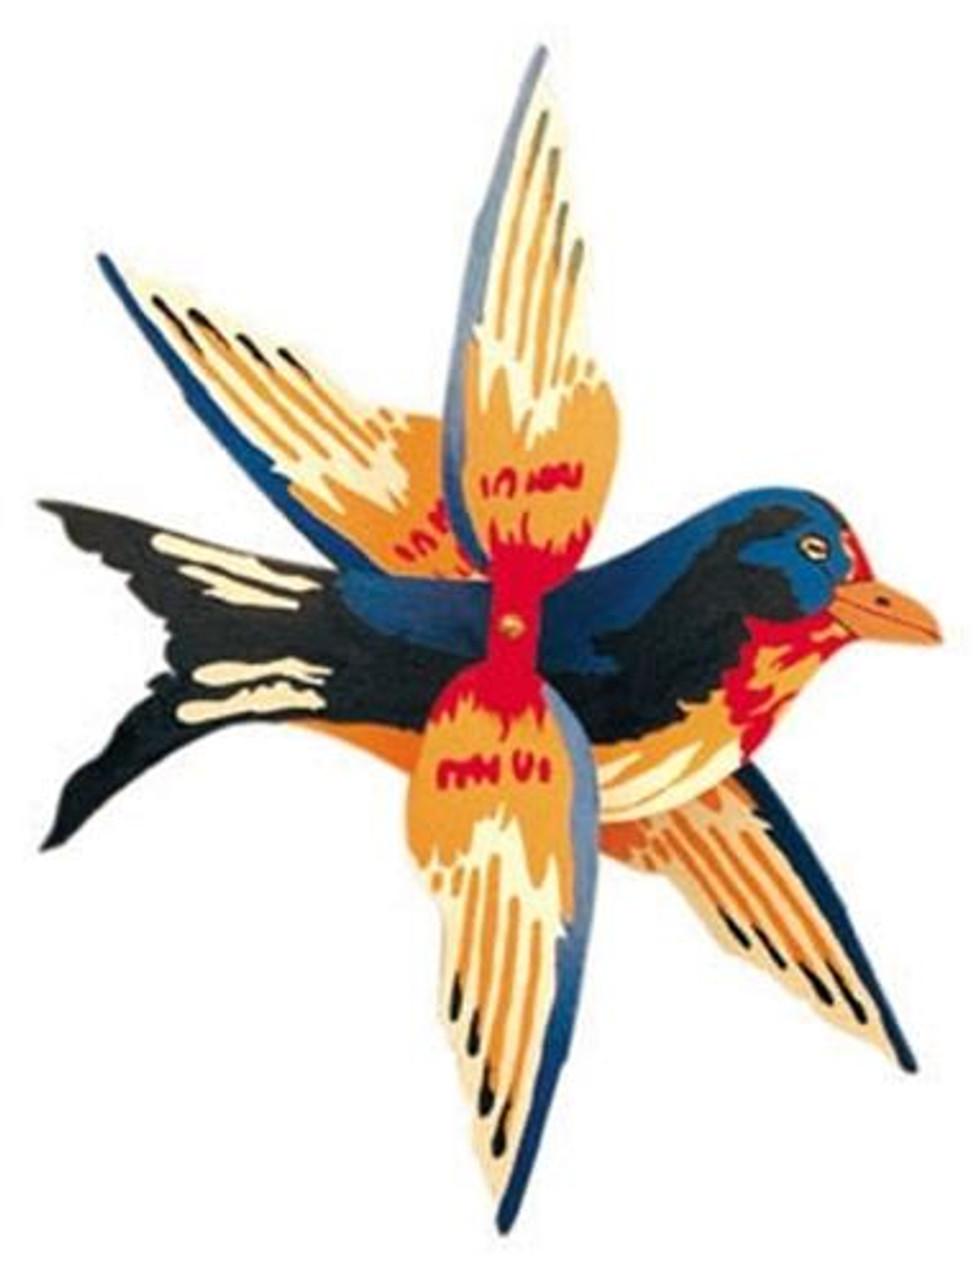 Cherry Tree Toys Barn Swallow Whirligig Plan